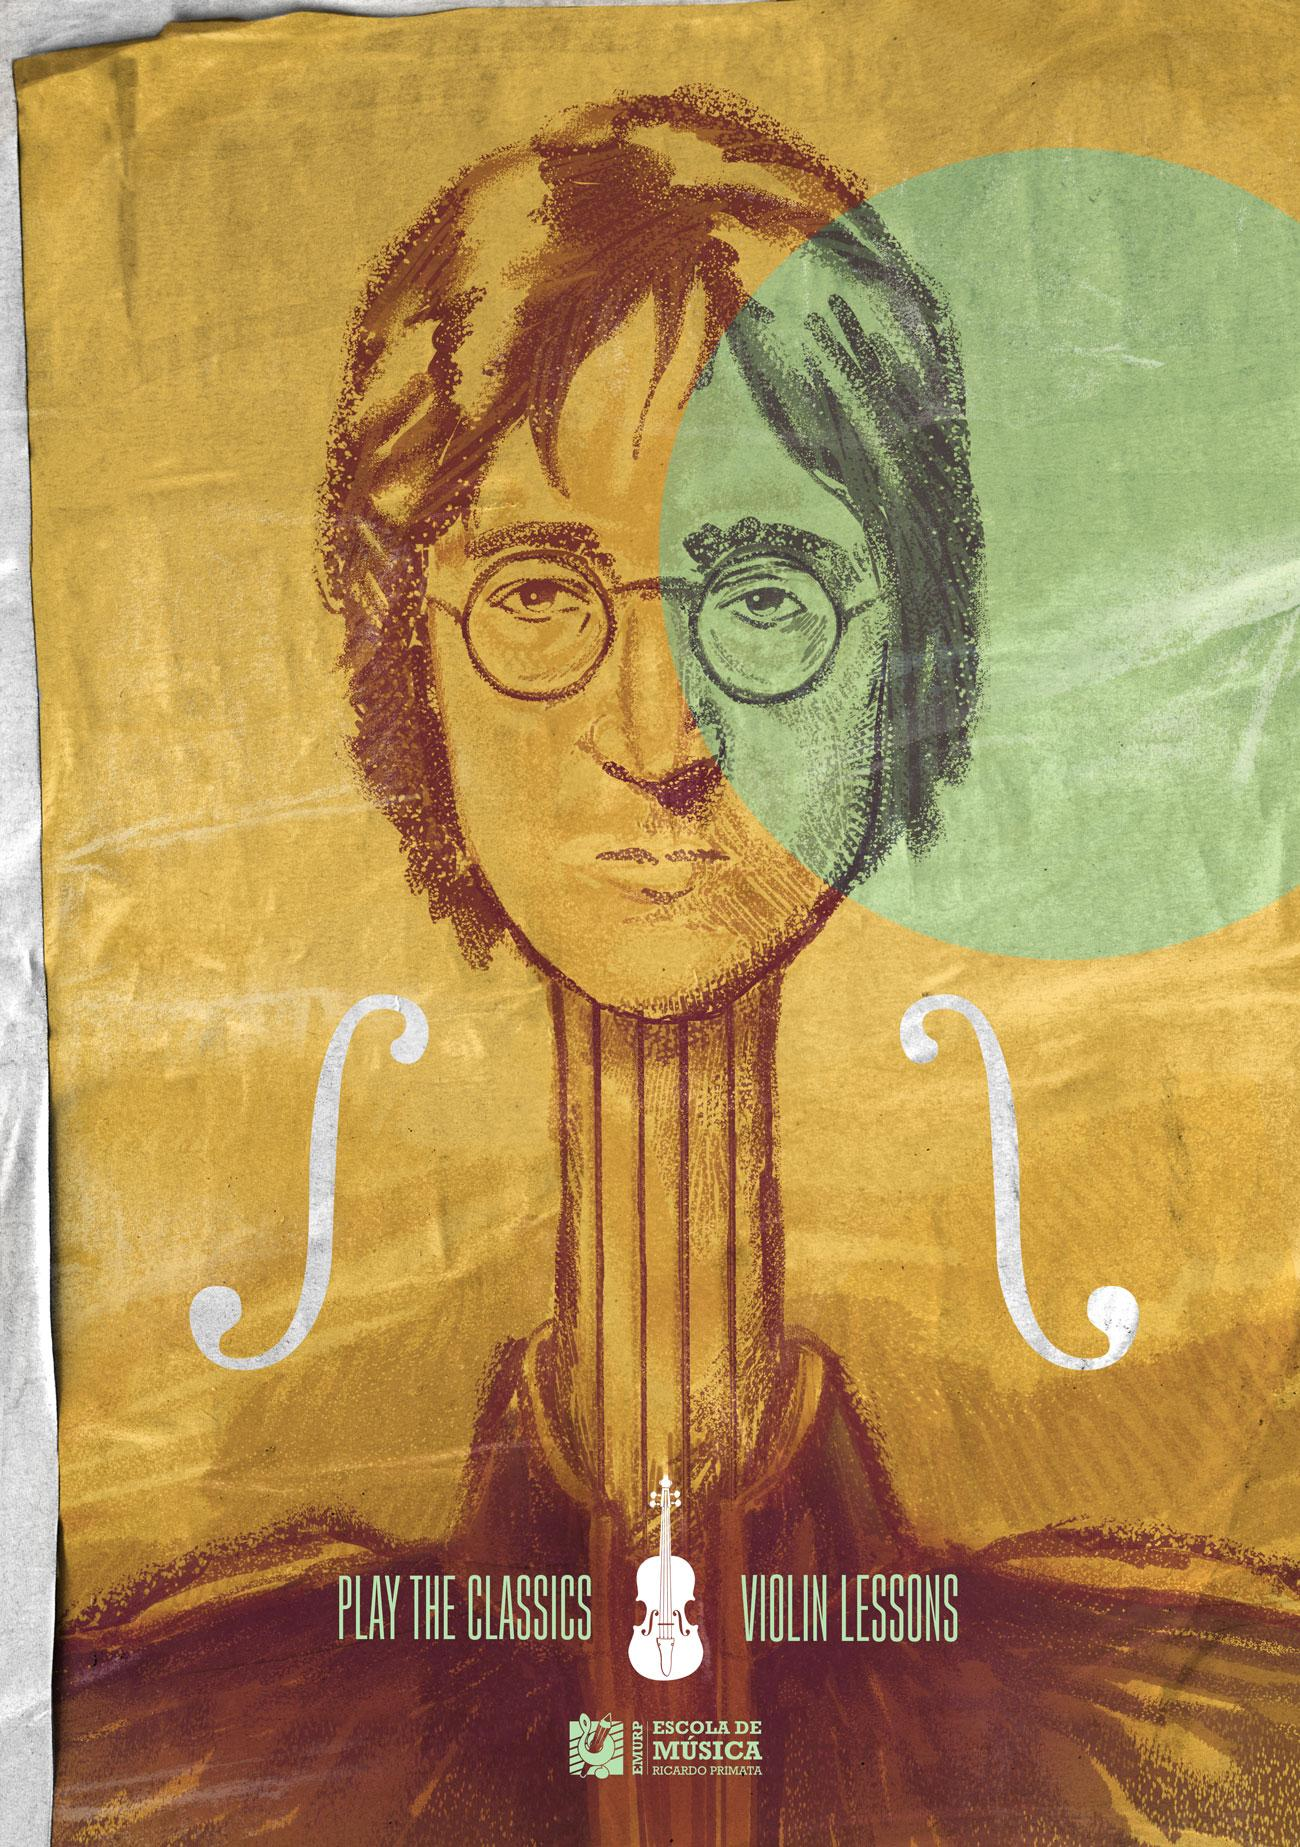 EMURP Music School Print Ad - Violin Lessons  - Lennon